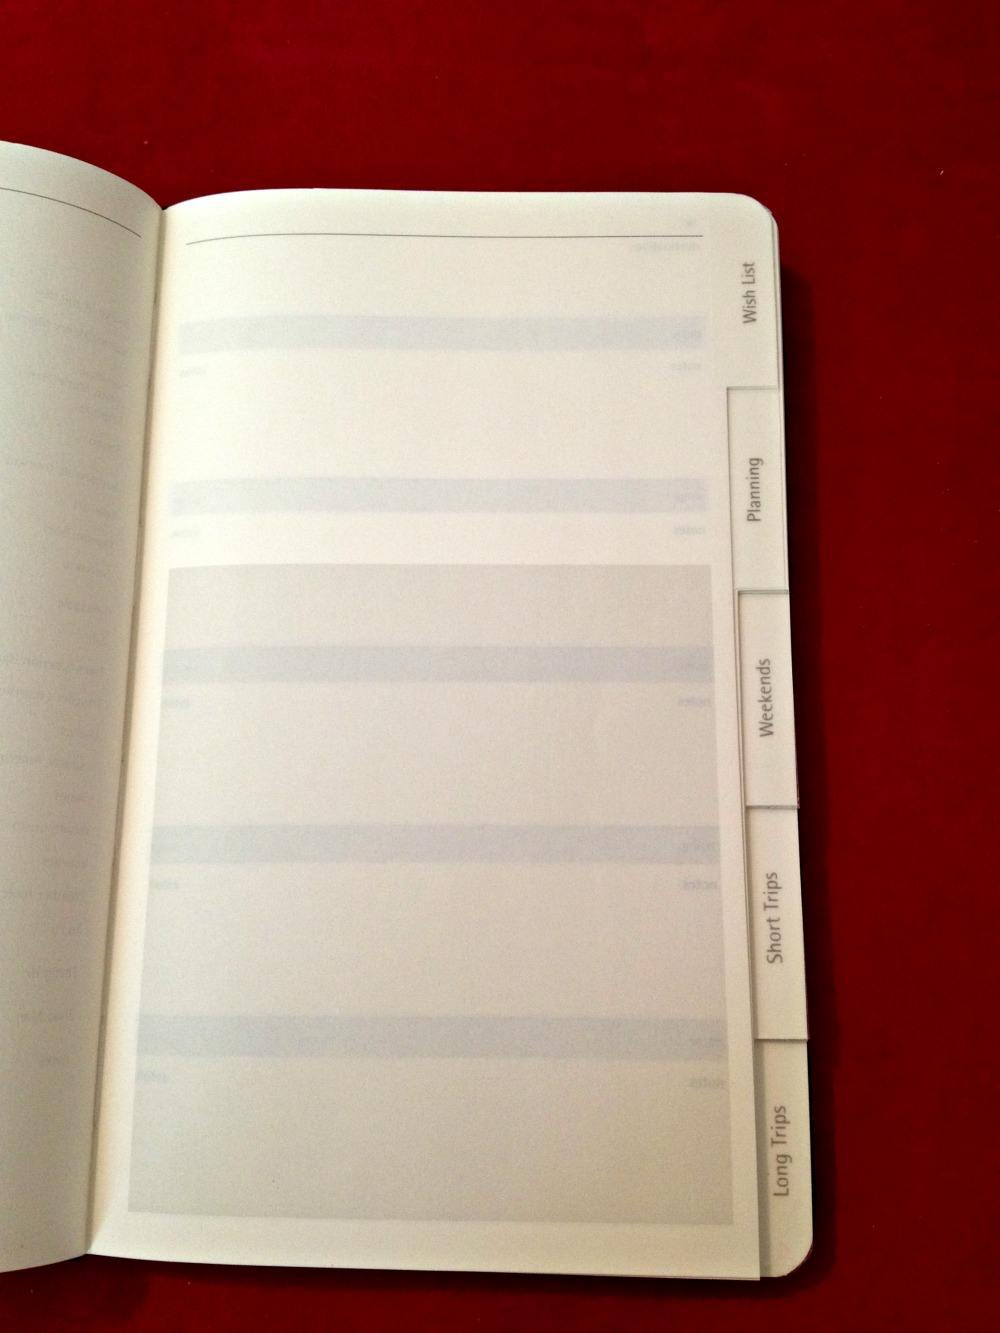 Moleskine Travel Journal sec 2 tabs